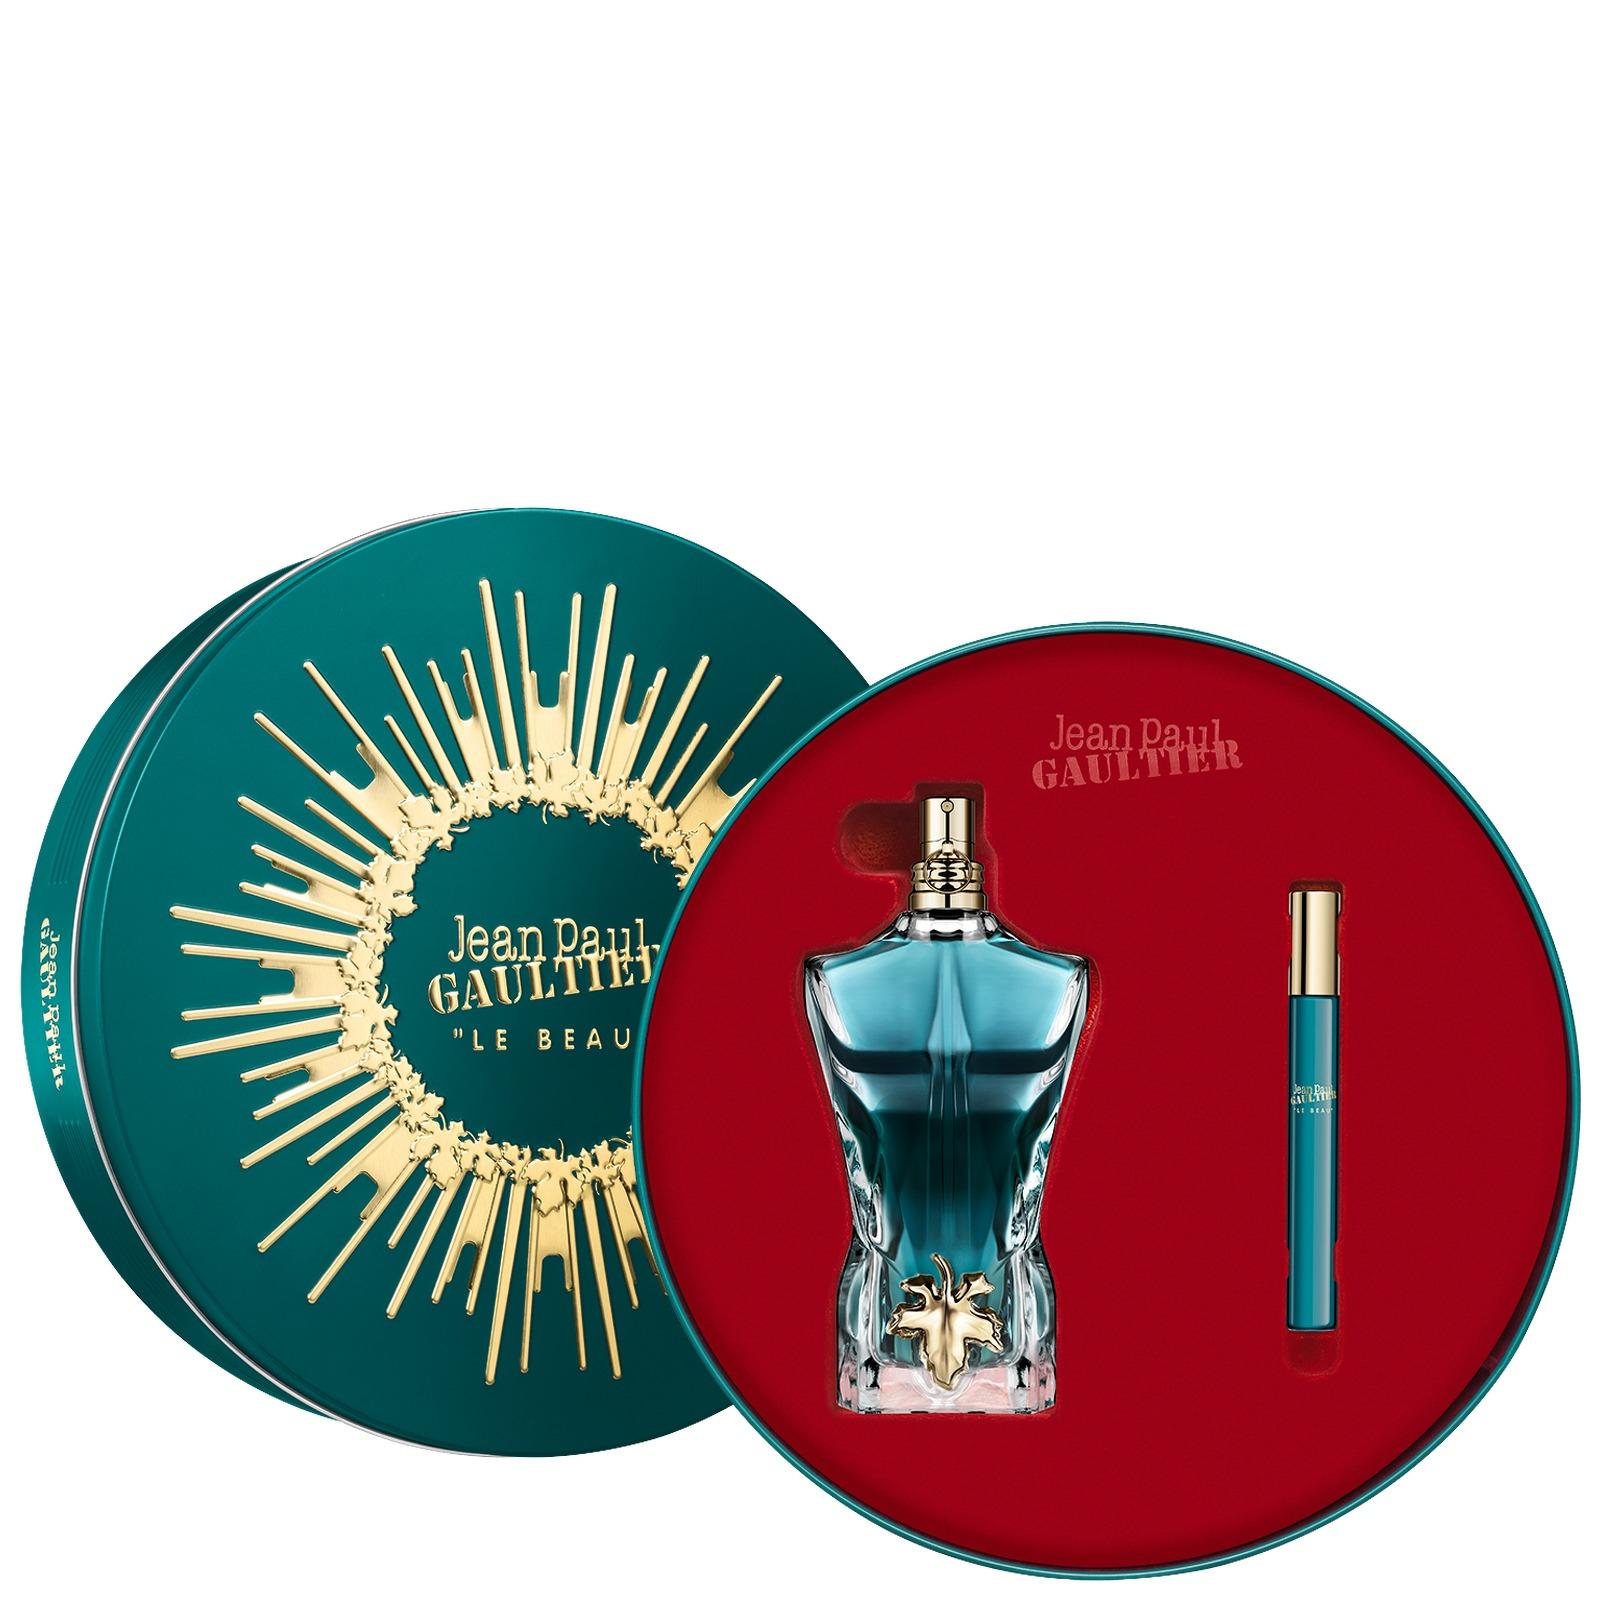 Jean Paul Gaultier Le Beau Eau De Toilette Spray 125ml + 10ml Gift Set £51.30 Delivered @ All Beauty